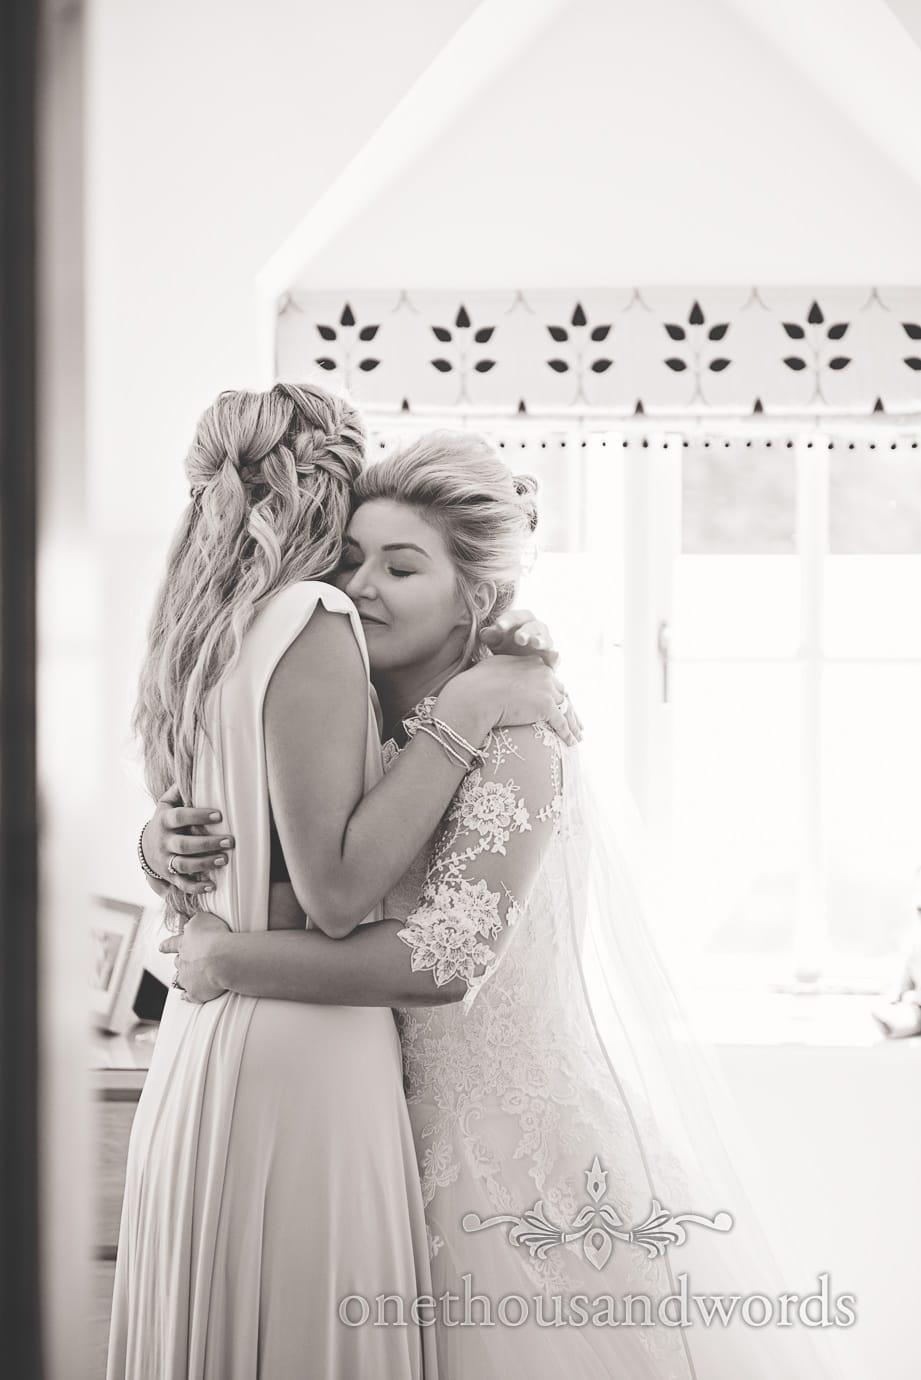 Black and white documentary wedding photograph of bride hugging bridesmaid on wedding morning